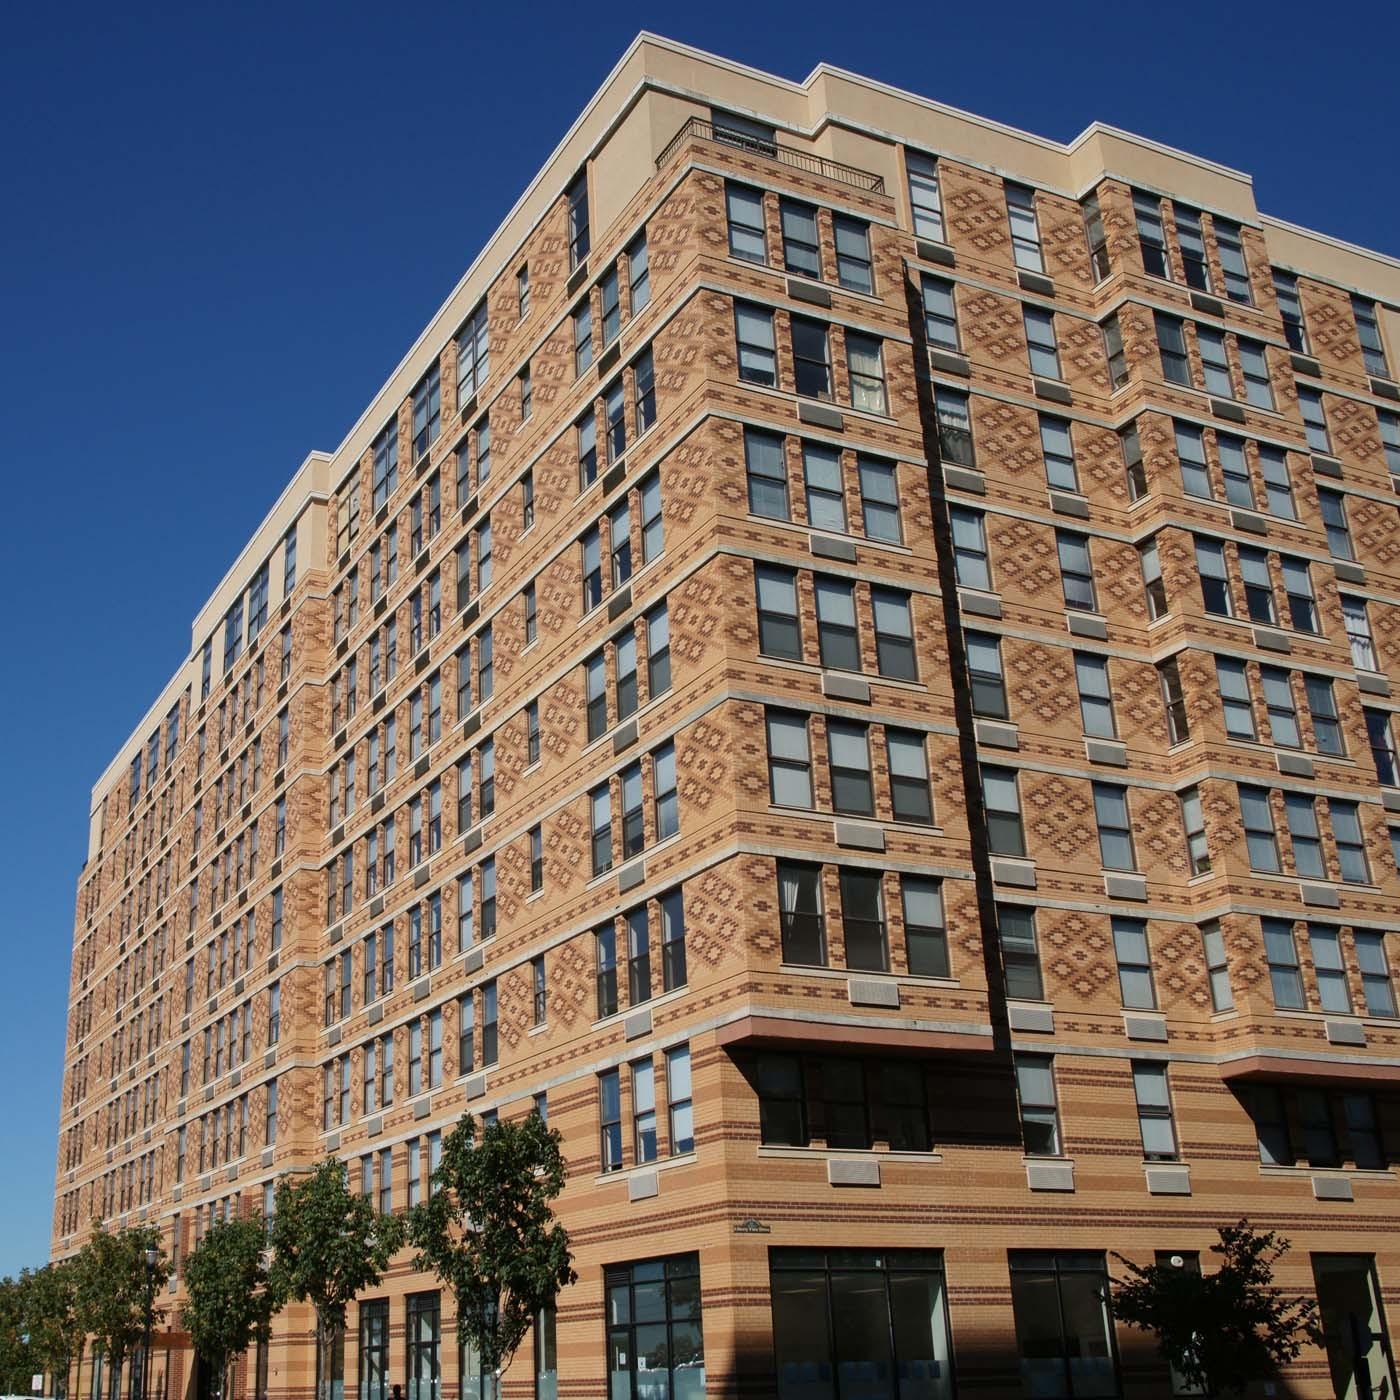 30 Regent Street 673 Jersey City NJ 07302 1 Bedroom Apartment For Rent For